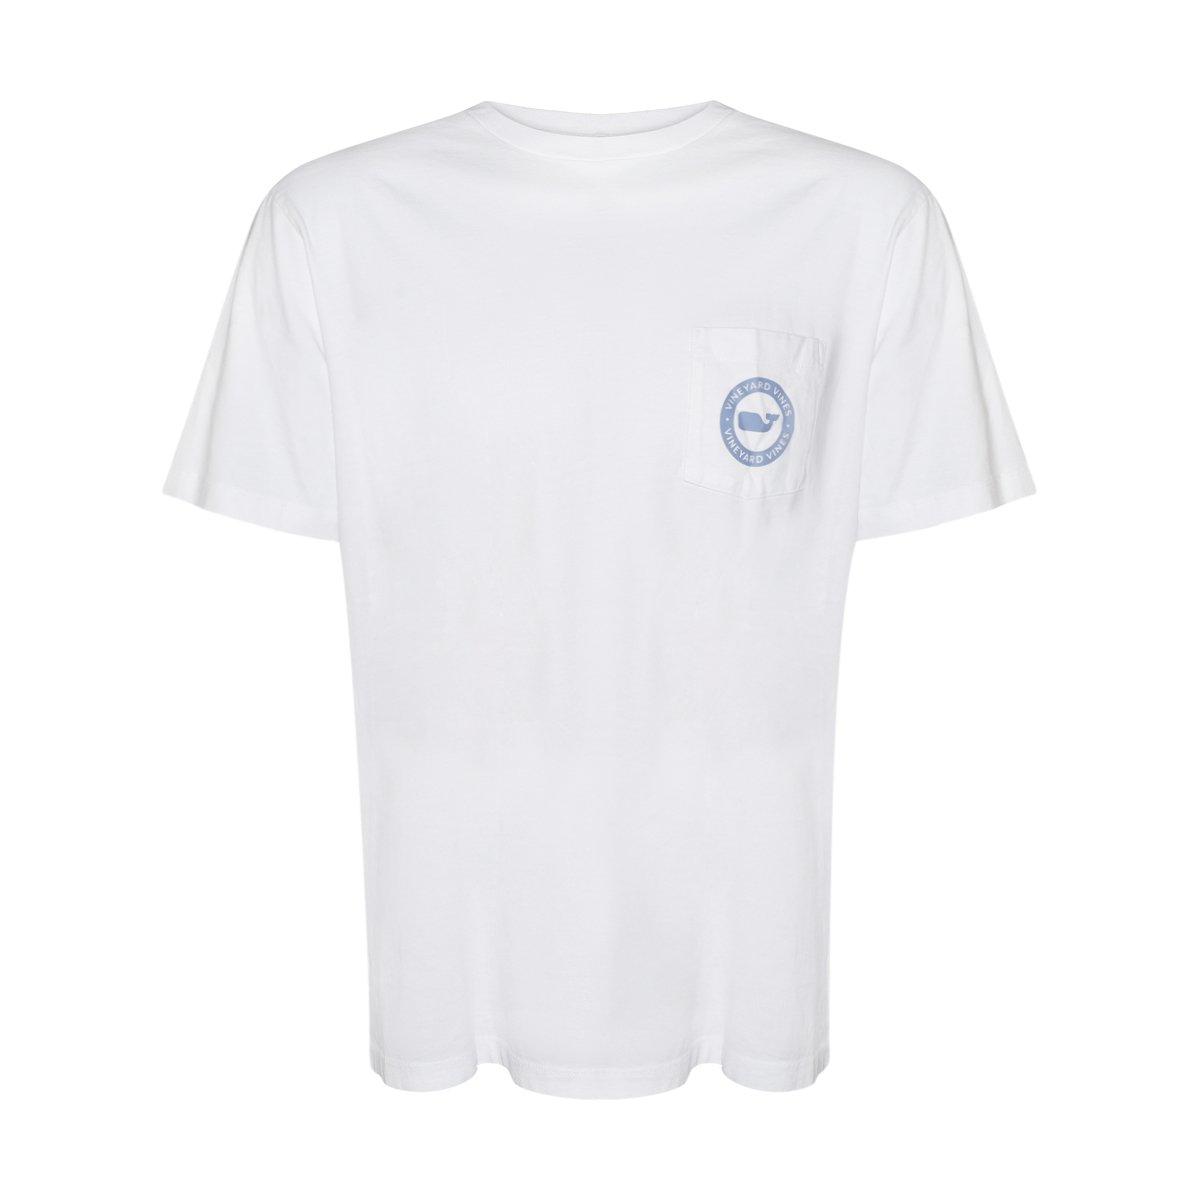 Vineyard Vinesメンズ半袖City Whale Teeシャツ B07581N25M X-Small|White Cap/Whale Dot White Cap/Whale Dot X-Small